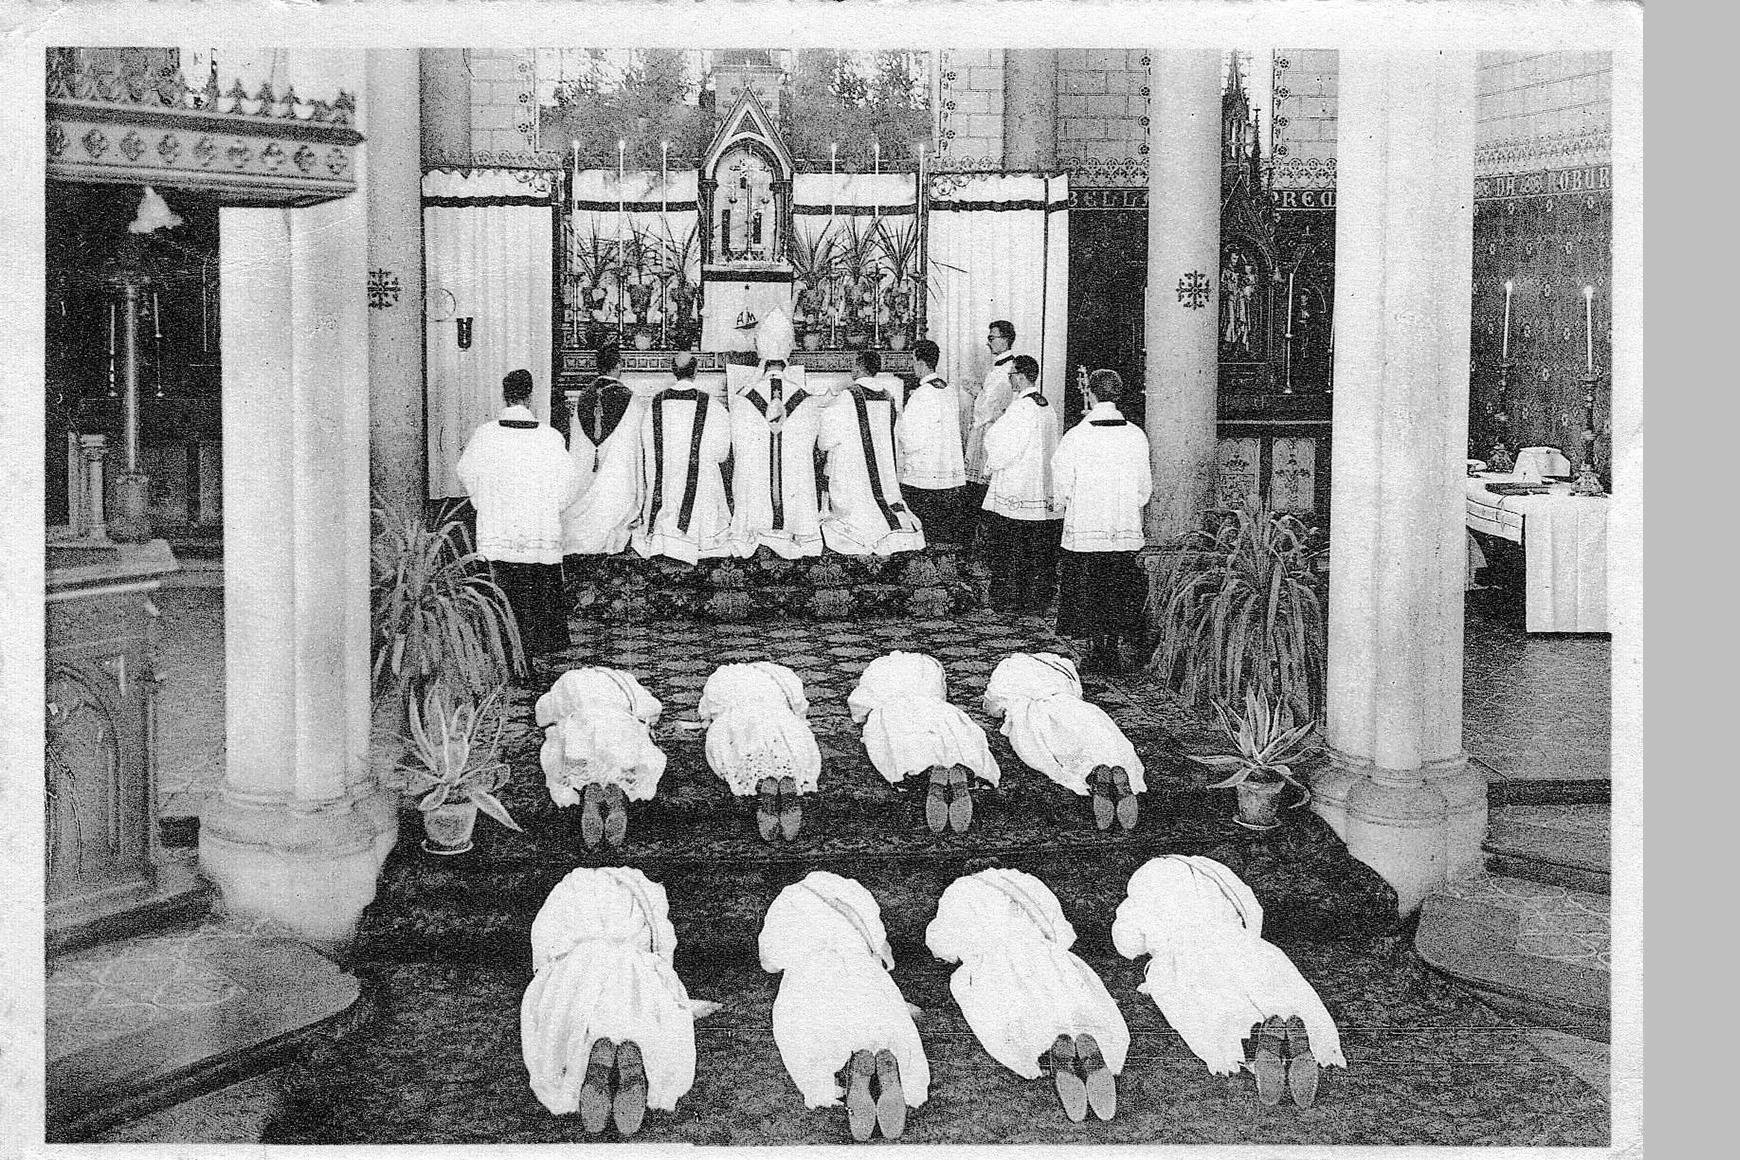 Foto E.Thill, Bruxelles, ca. 1936 / Collectie Margit Willems